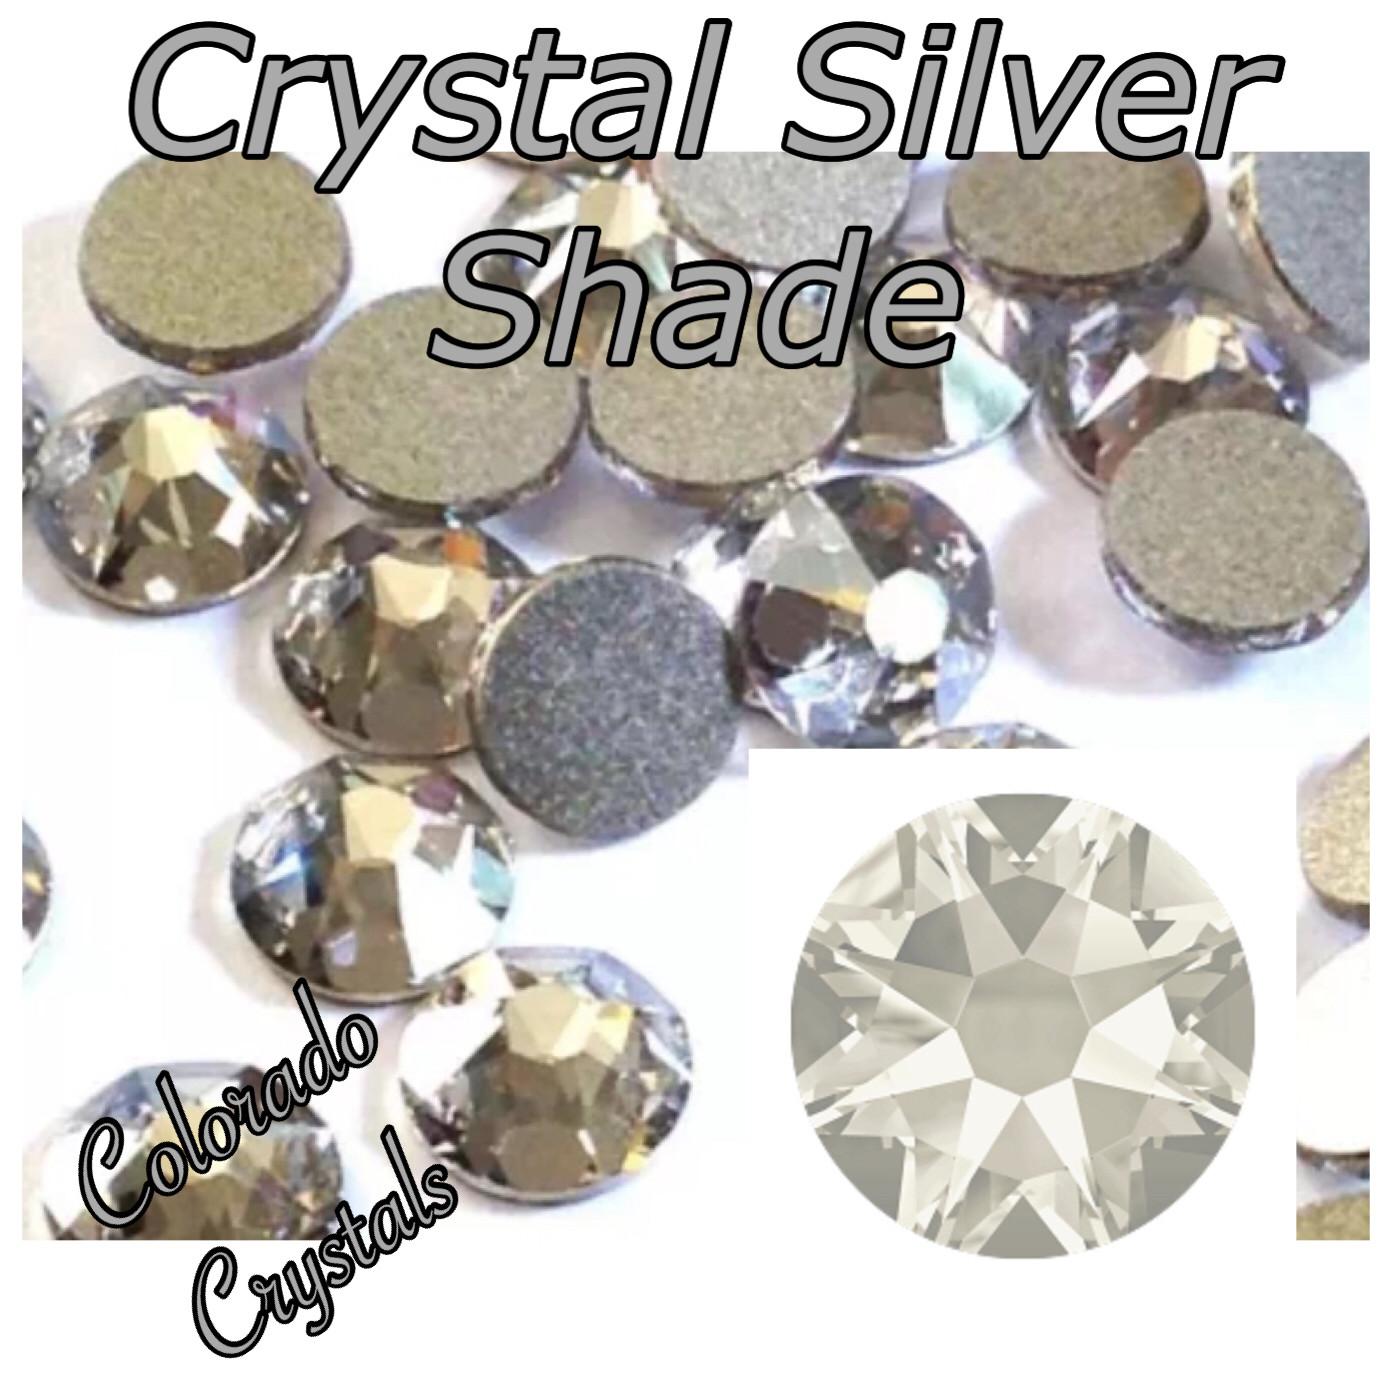 Silver Shade (Crystal) 12ss 2088 Limited Swarovski Rhinestones